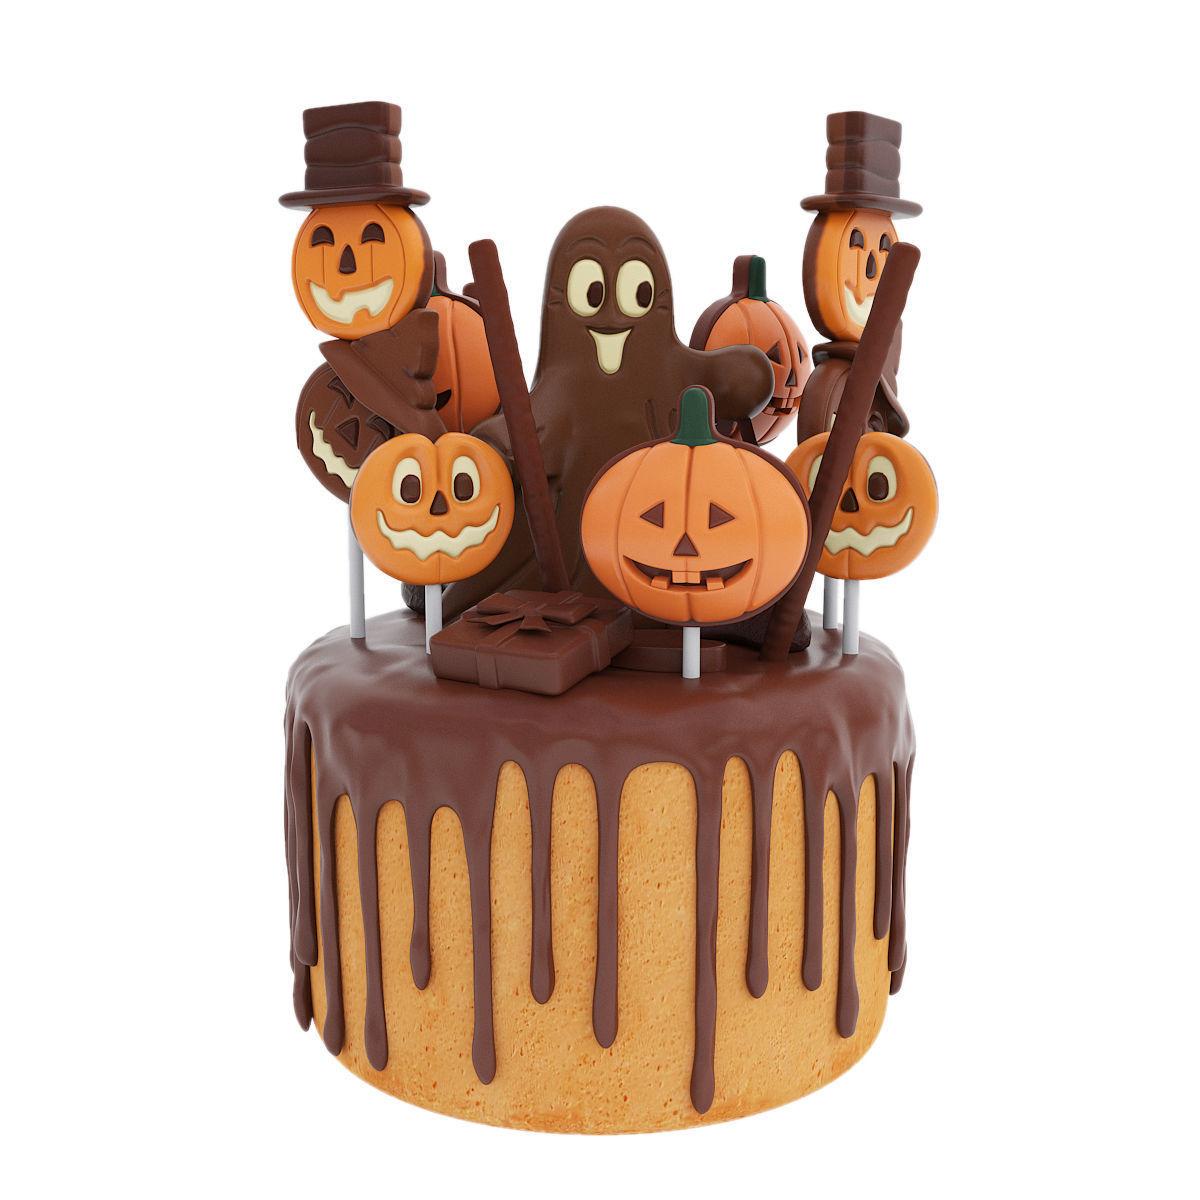 Halloween cake with pumpkin figurines